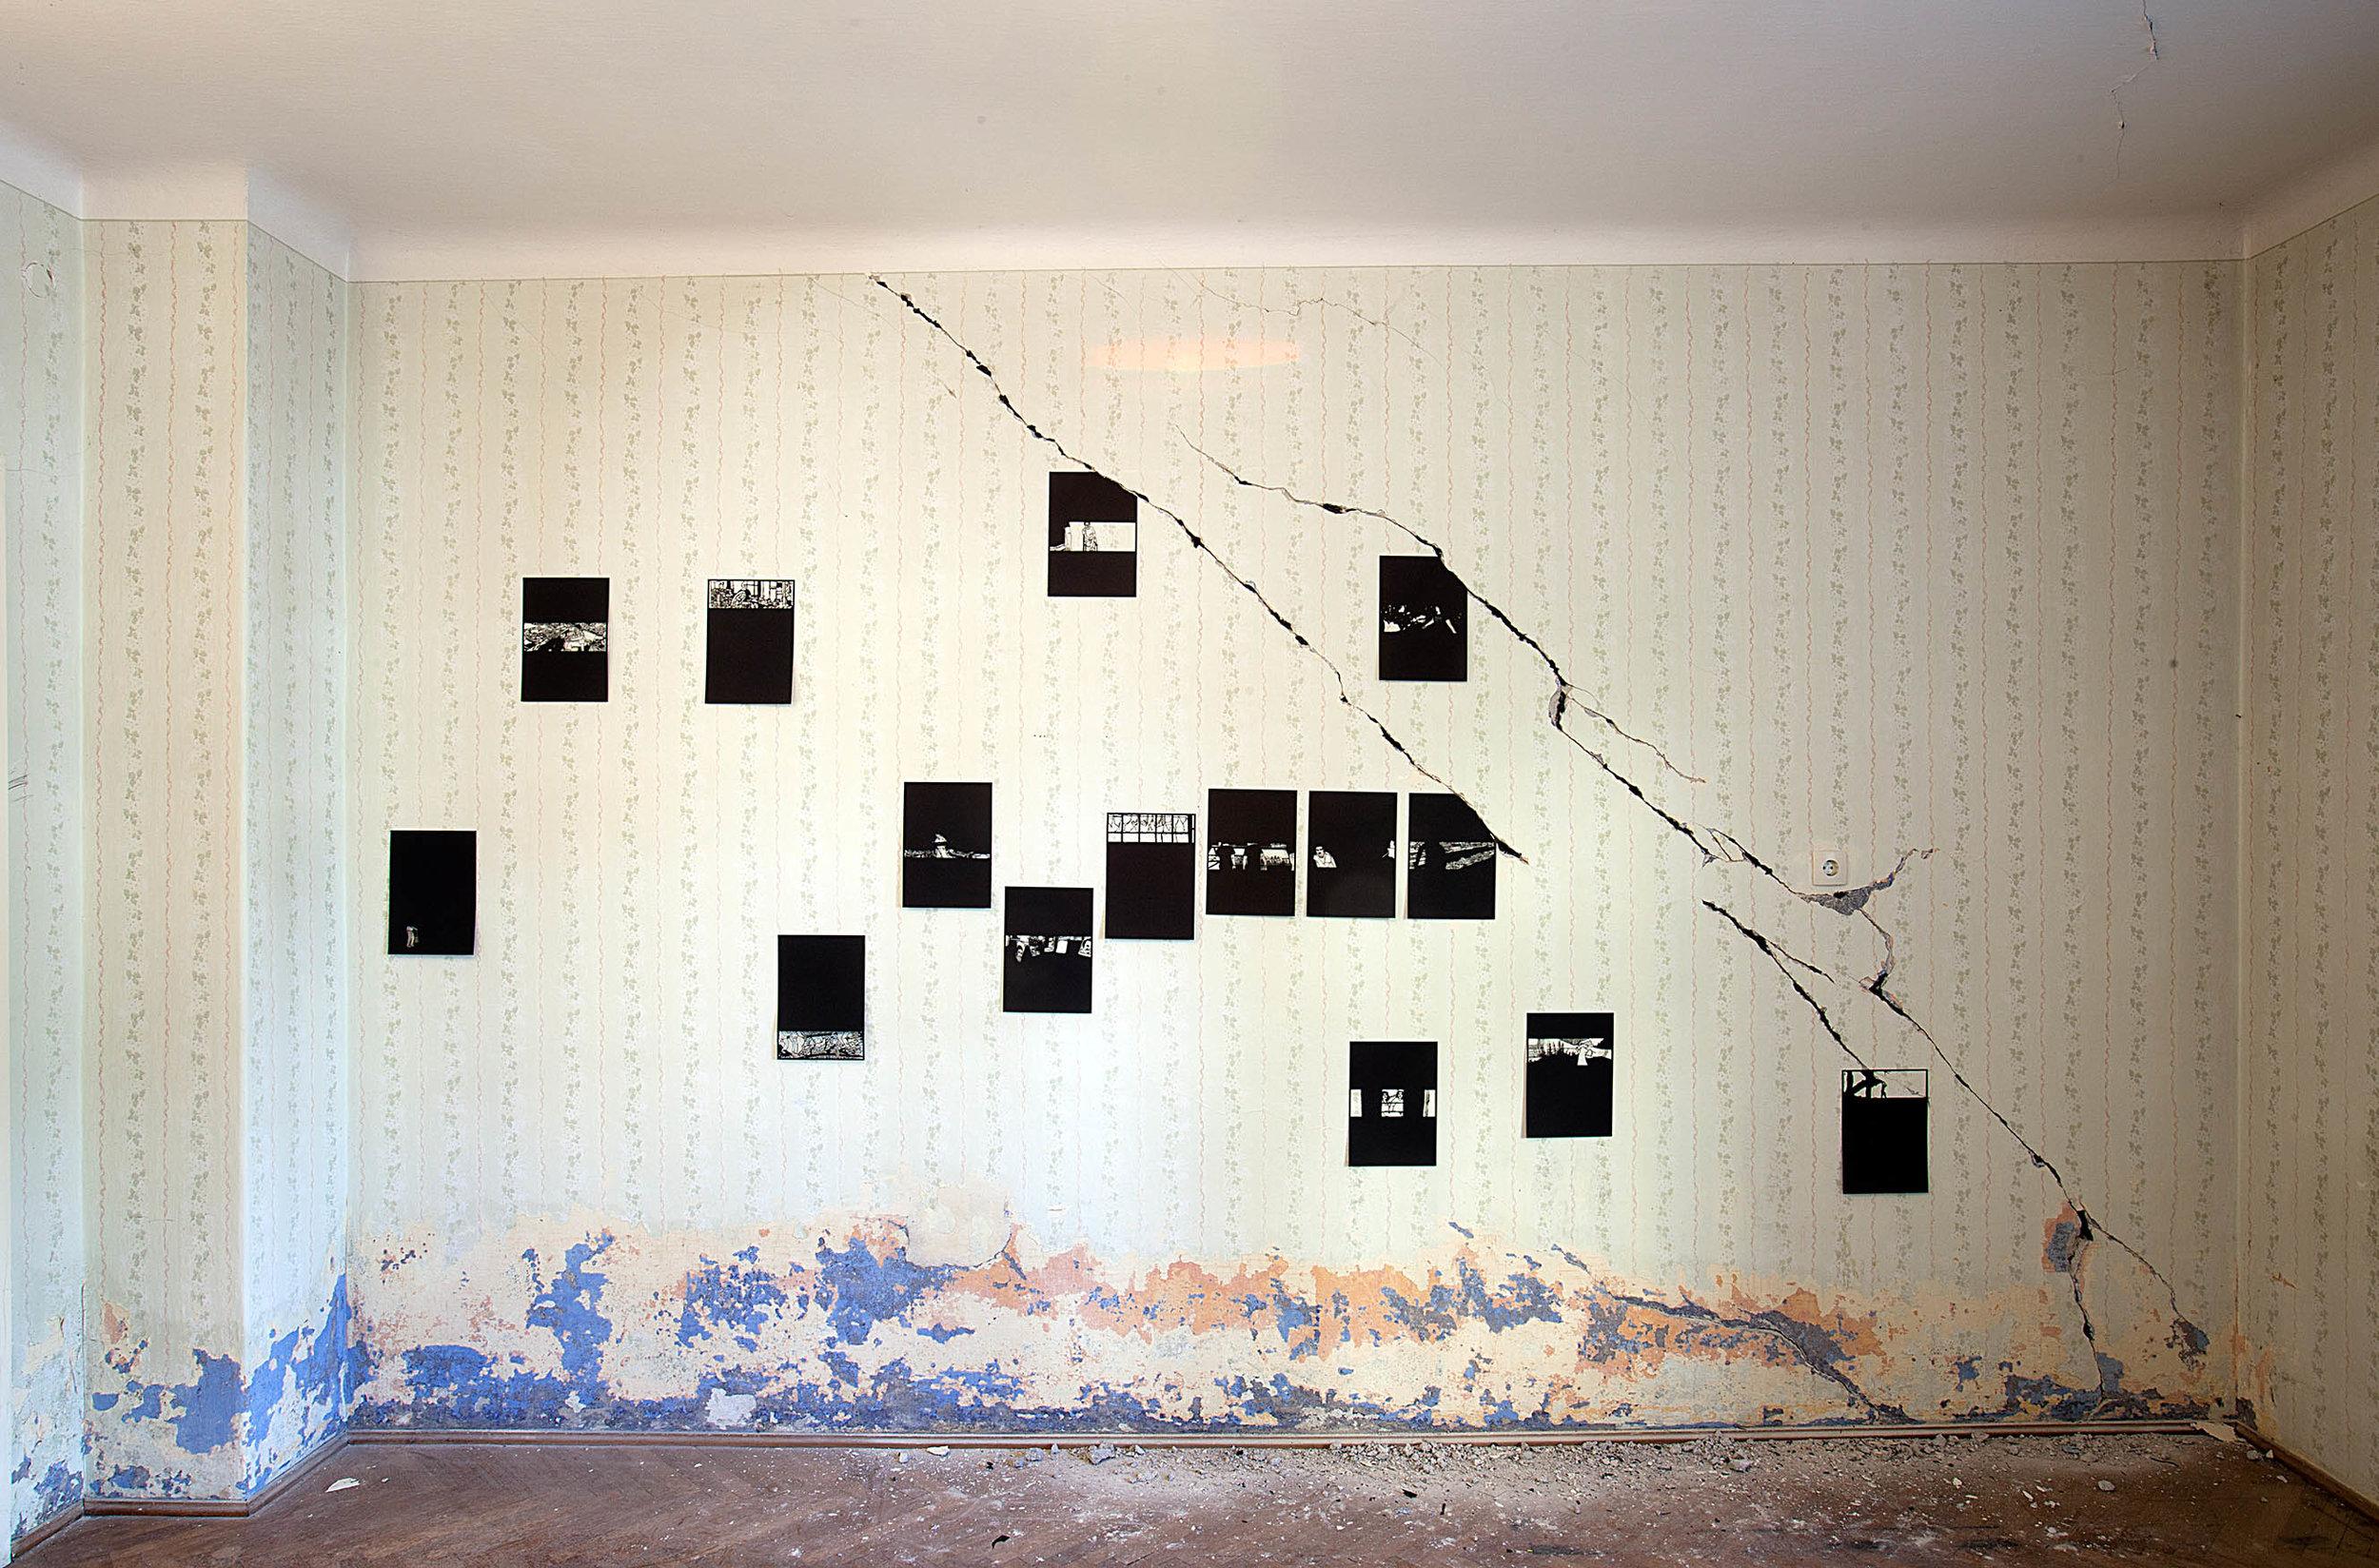 Copy of around the cracks